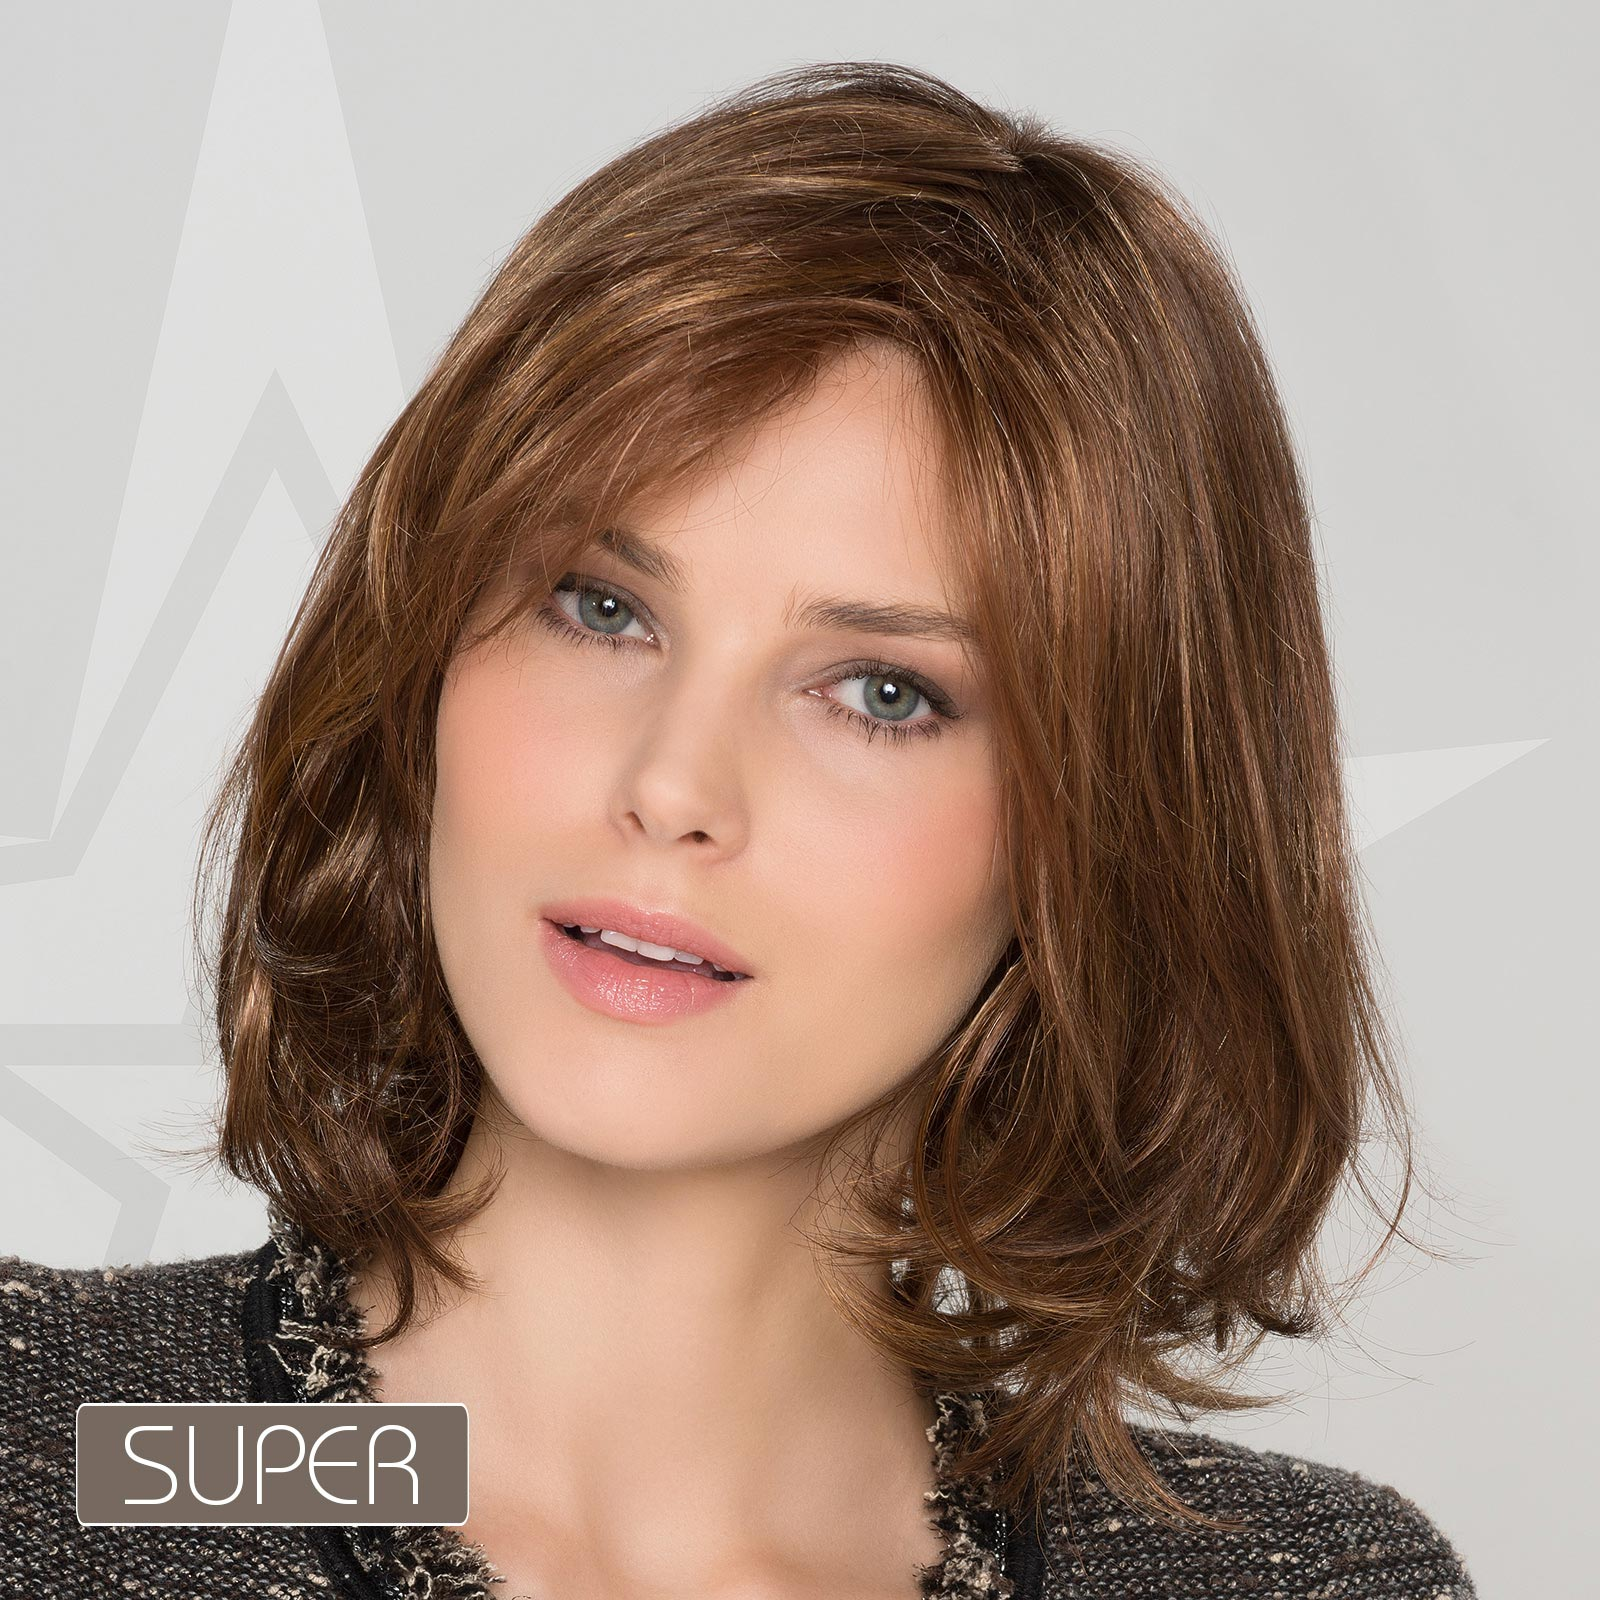 Prótese Capilar Coleção Modixx HairWear Modelo London Super